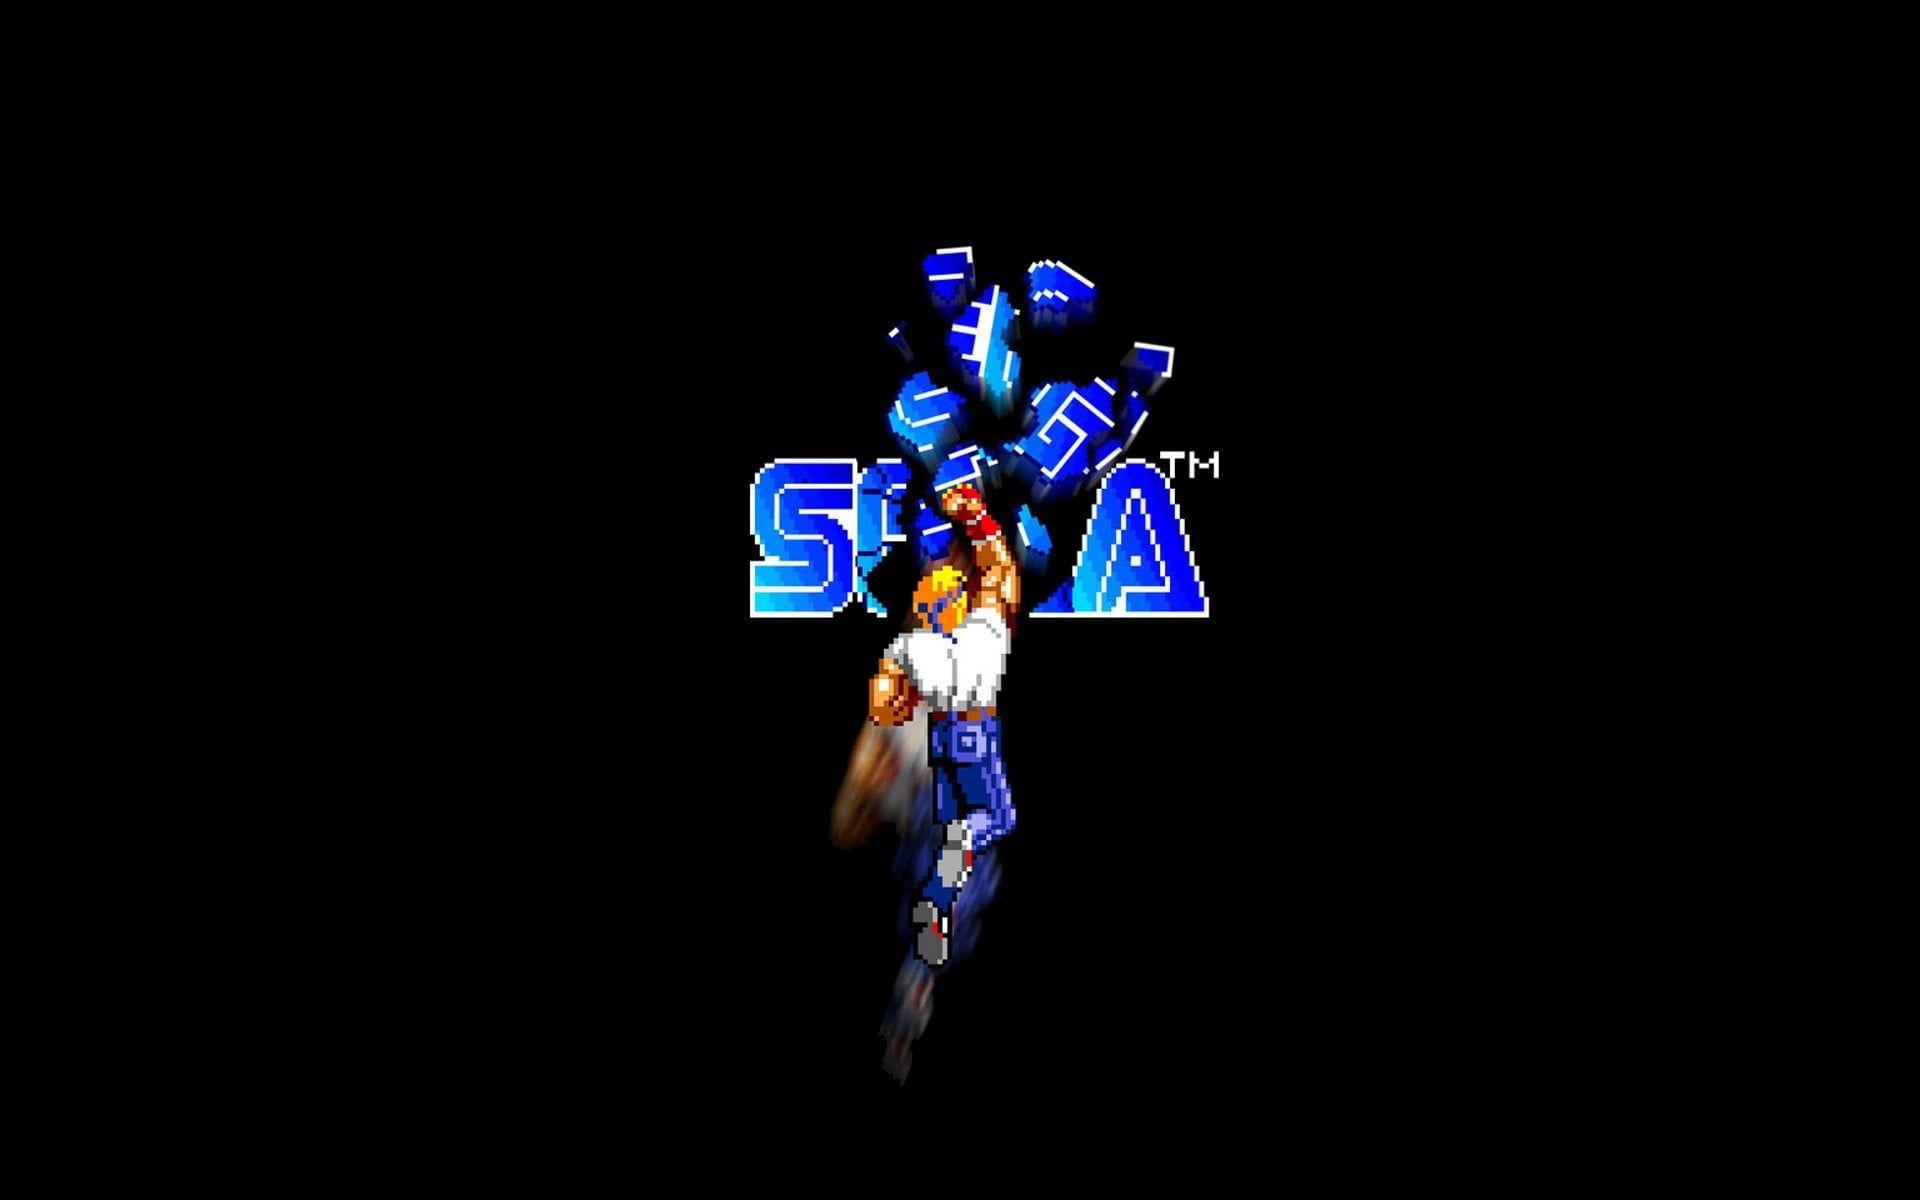 Sega Streets Of Rage Simple Background 16 Bit Axel Stone 1080p Wallpaper Hdwallpaper Desktop Simple Backgrounds Retro Video Games Hd Wallpaper